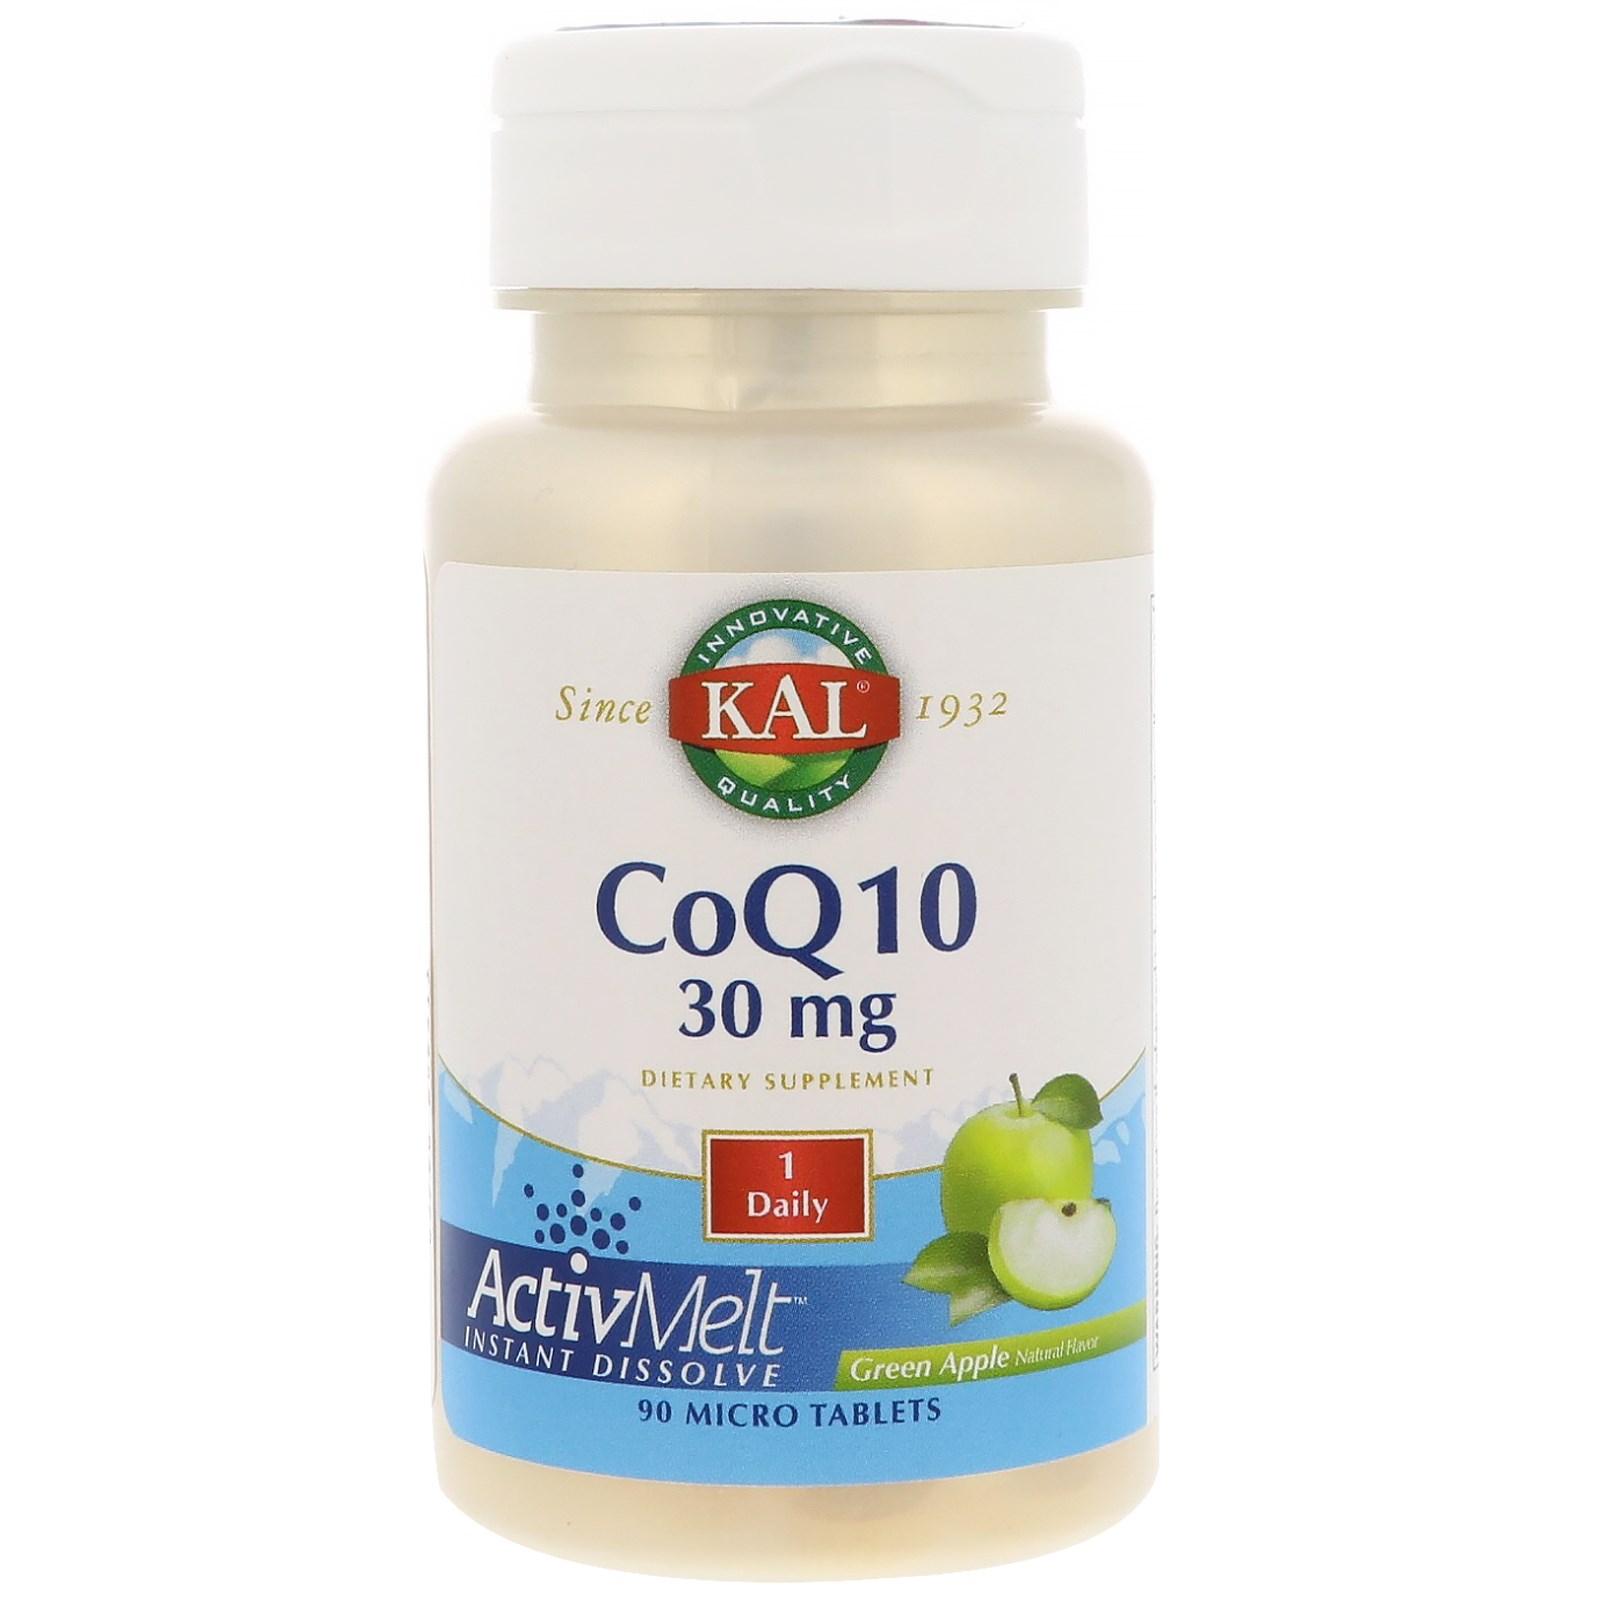 KAL, CoQ10, Green Apple, 30 mg, 90 Micro Tablets